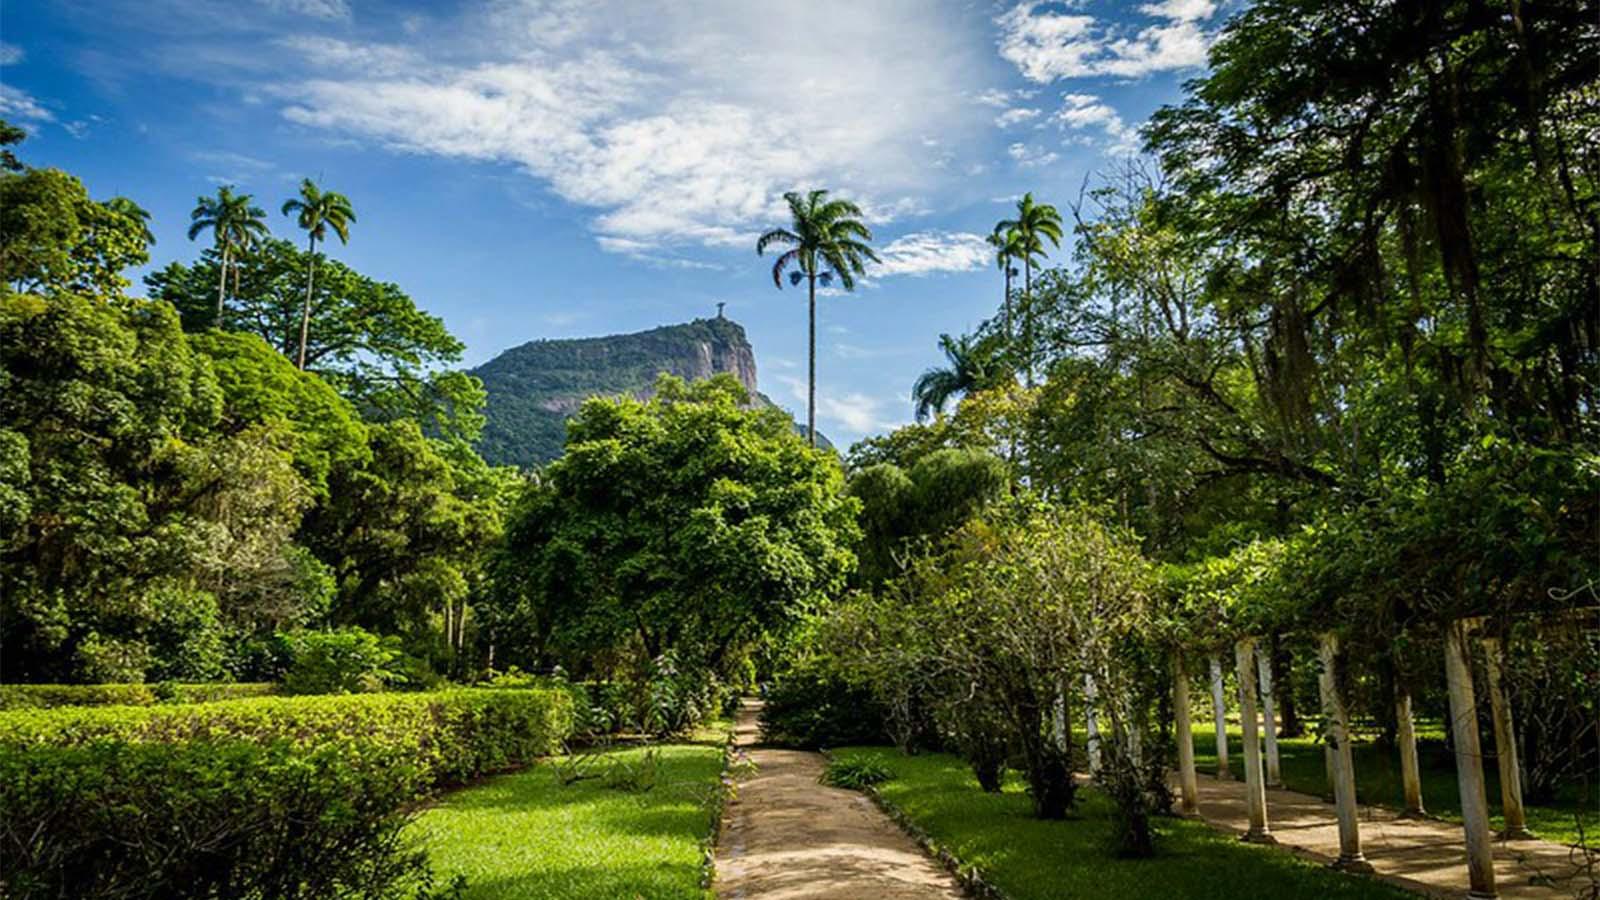 Jardín botánico de Río